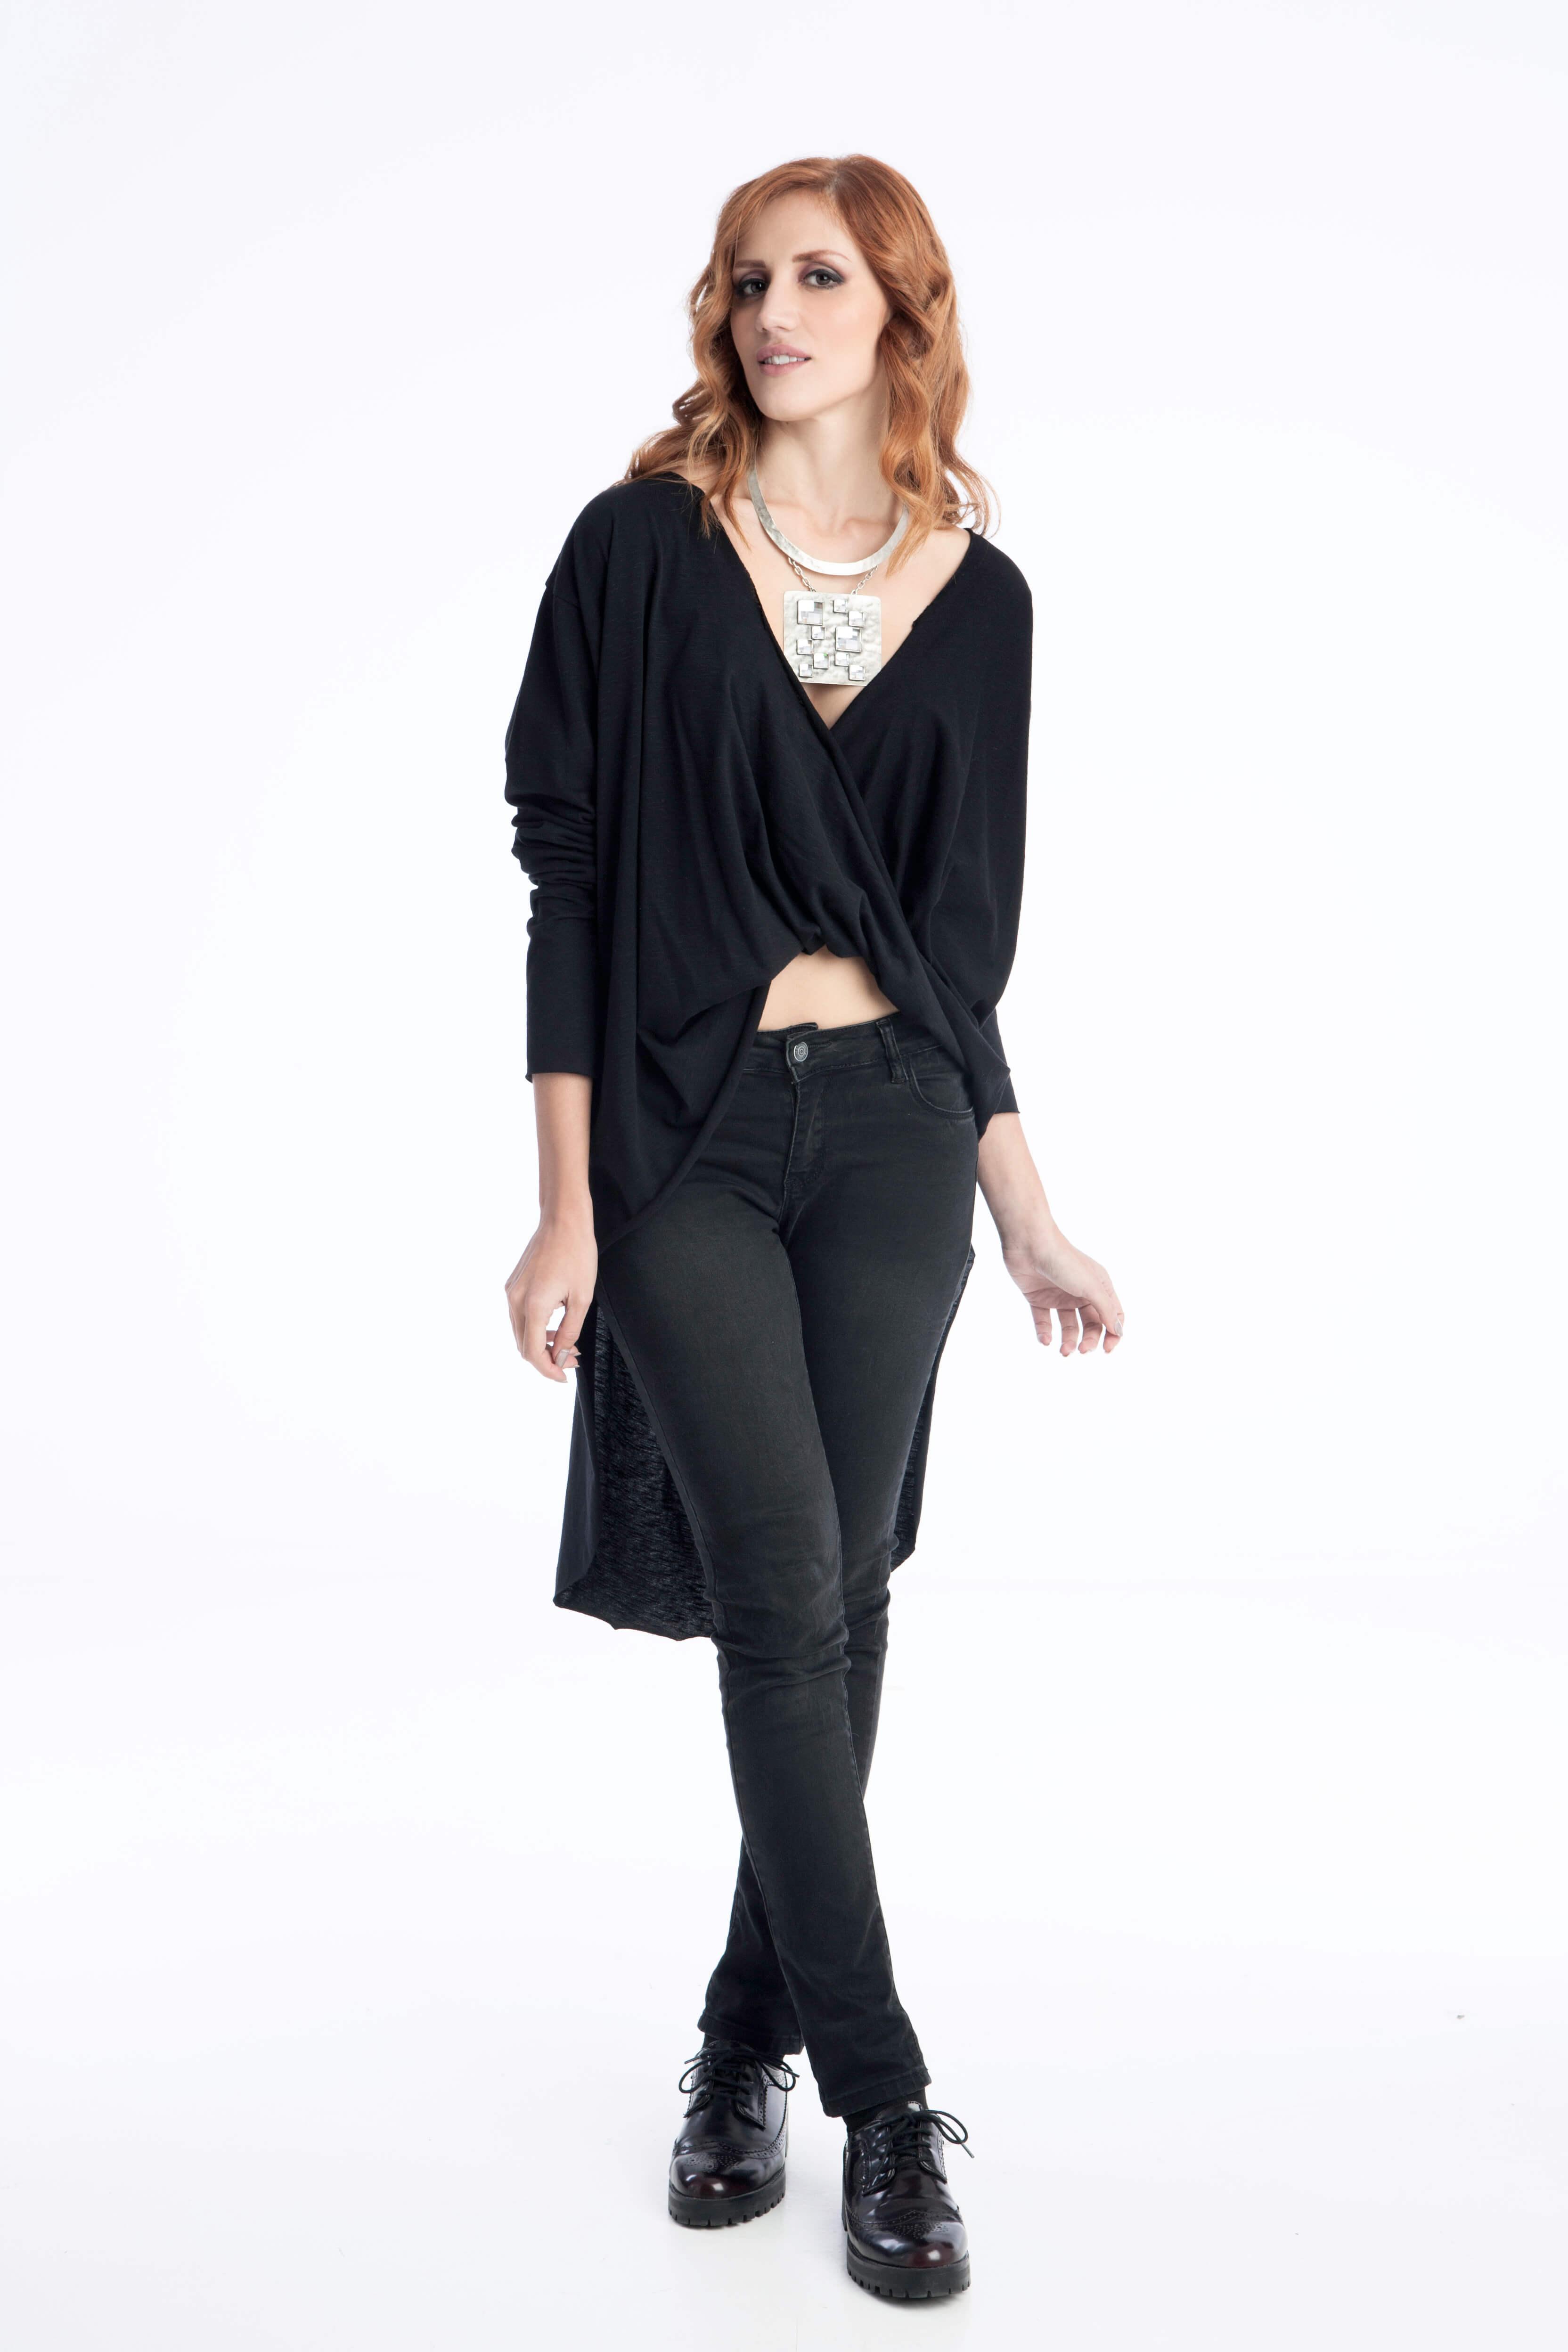 f2554dd1c617 Γυναικεία Μπλούζα Ασύμμετρη με Μανίκια - Prestige Fashion